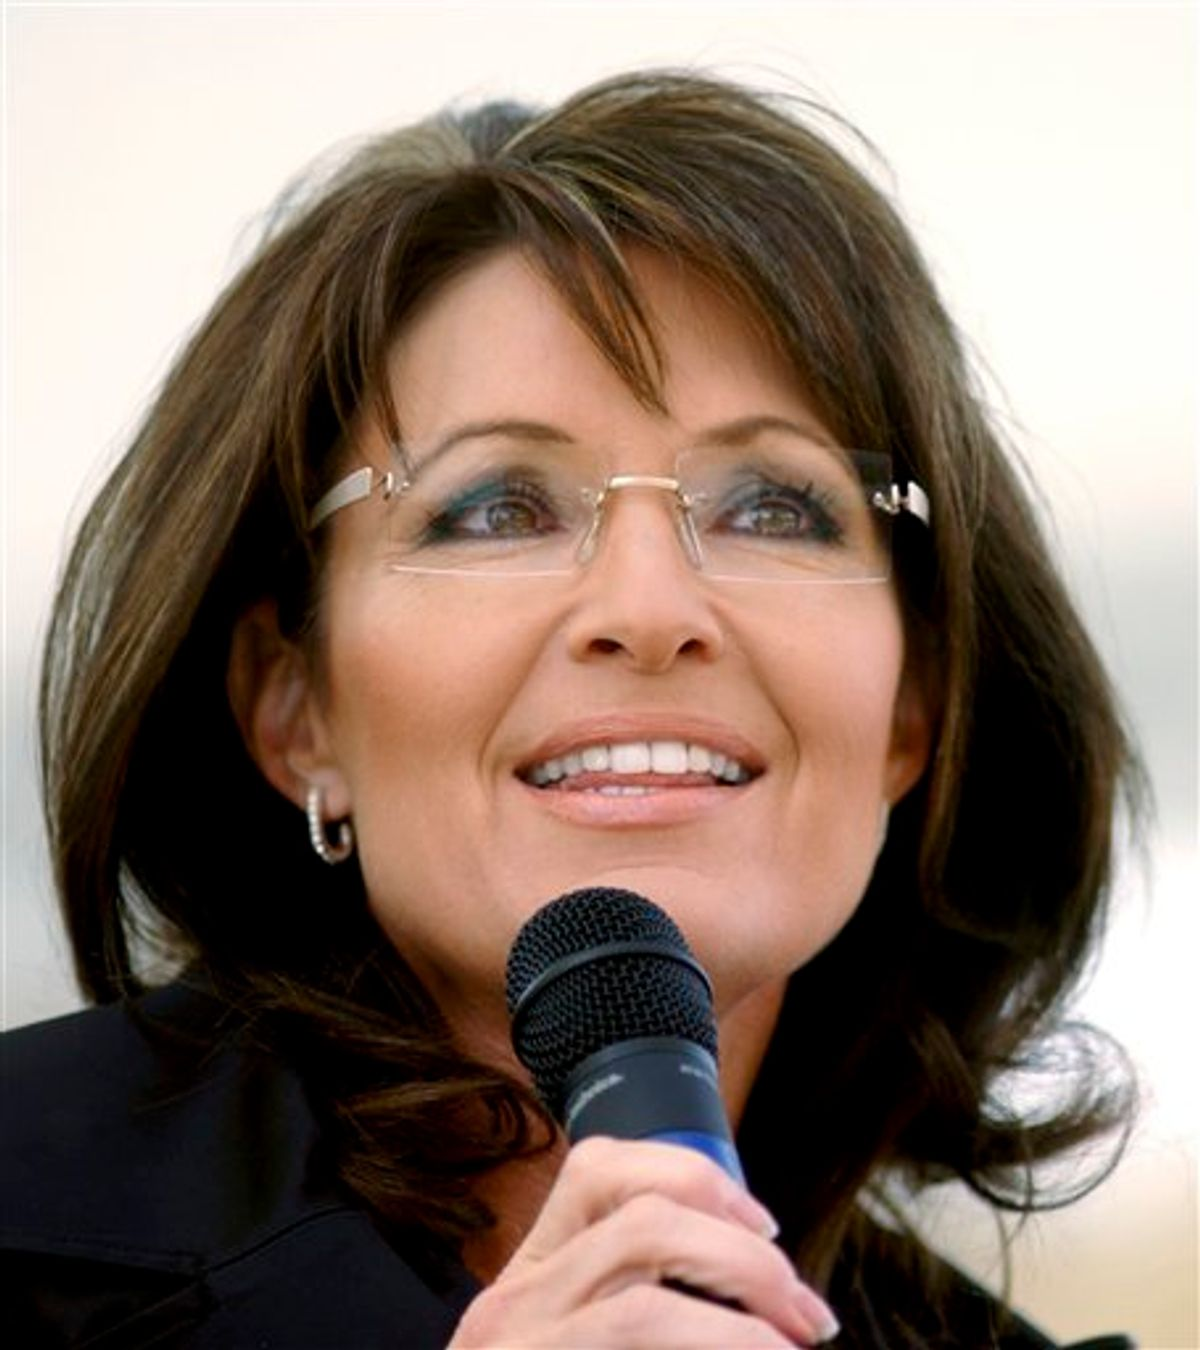 Sarah Palin stumps for Republican candidate for Senate, John Raese, during a rally at Haddad Riverfront Park in Charleston, W.Va., on Saturday, Oct. 30, 2010. (AP Photo/Jon C. Hancock) (AP)